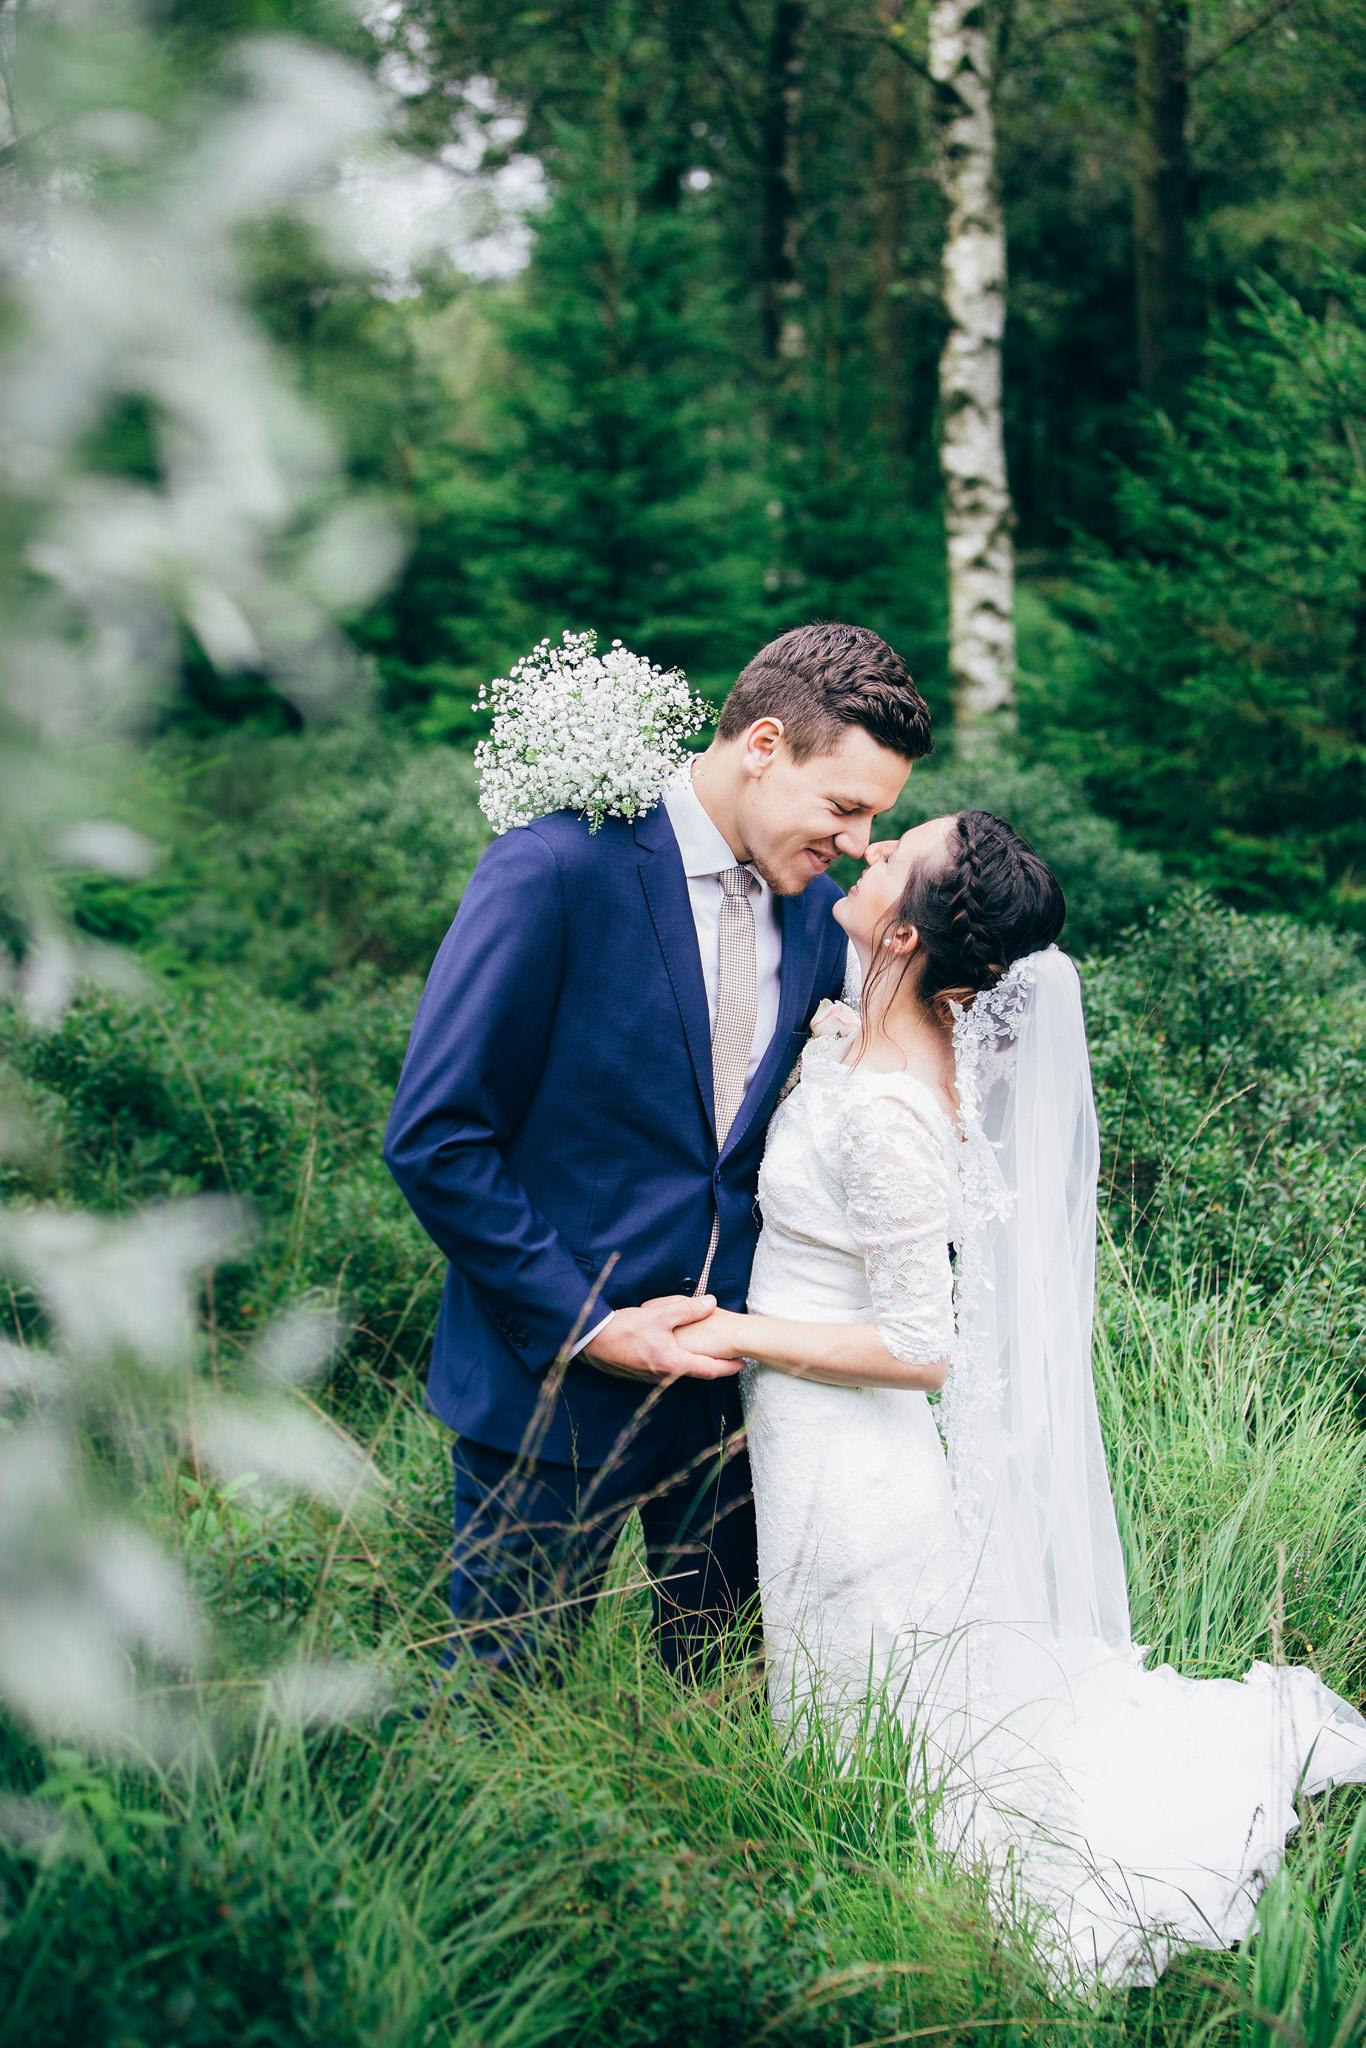 Norway+wedding+photographer+elopement+pre+wedding+Casey+Arneson-60.jpg